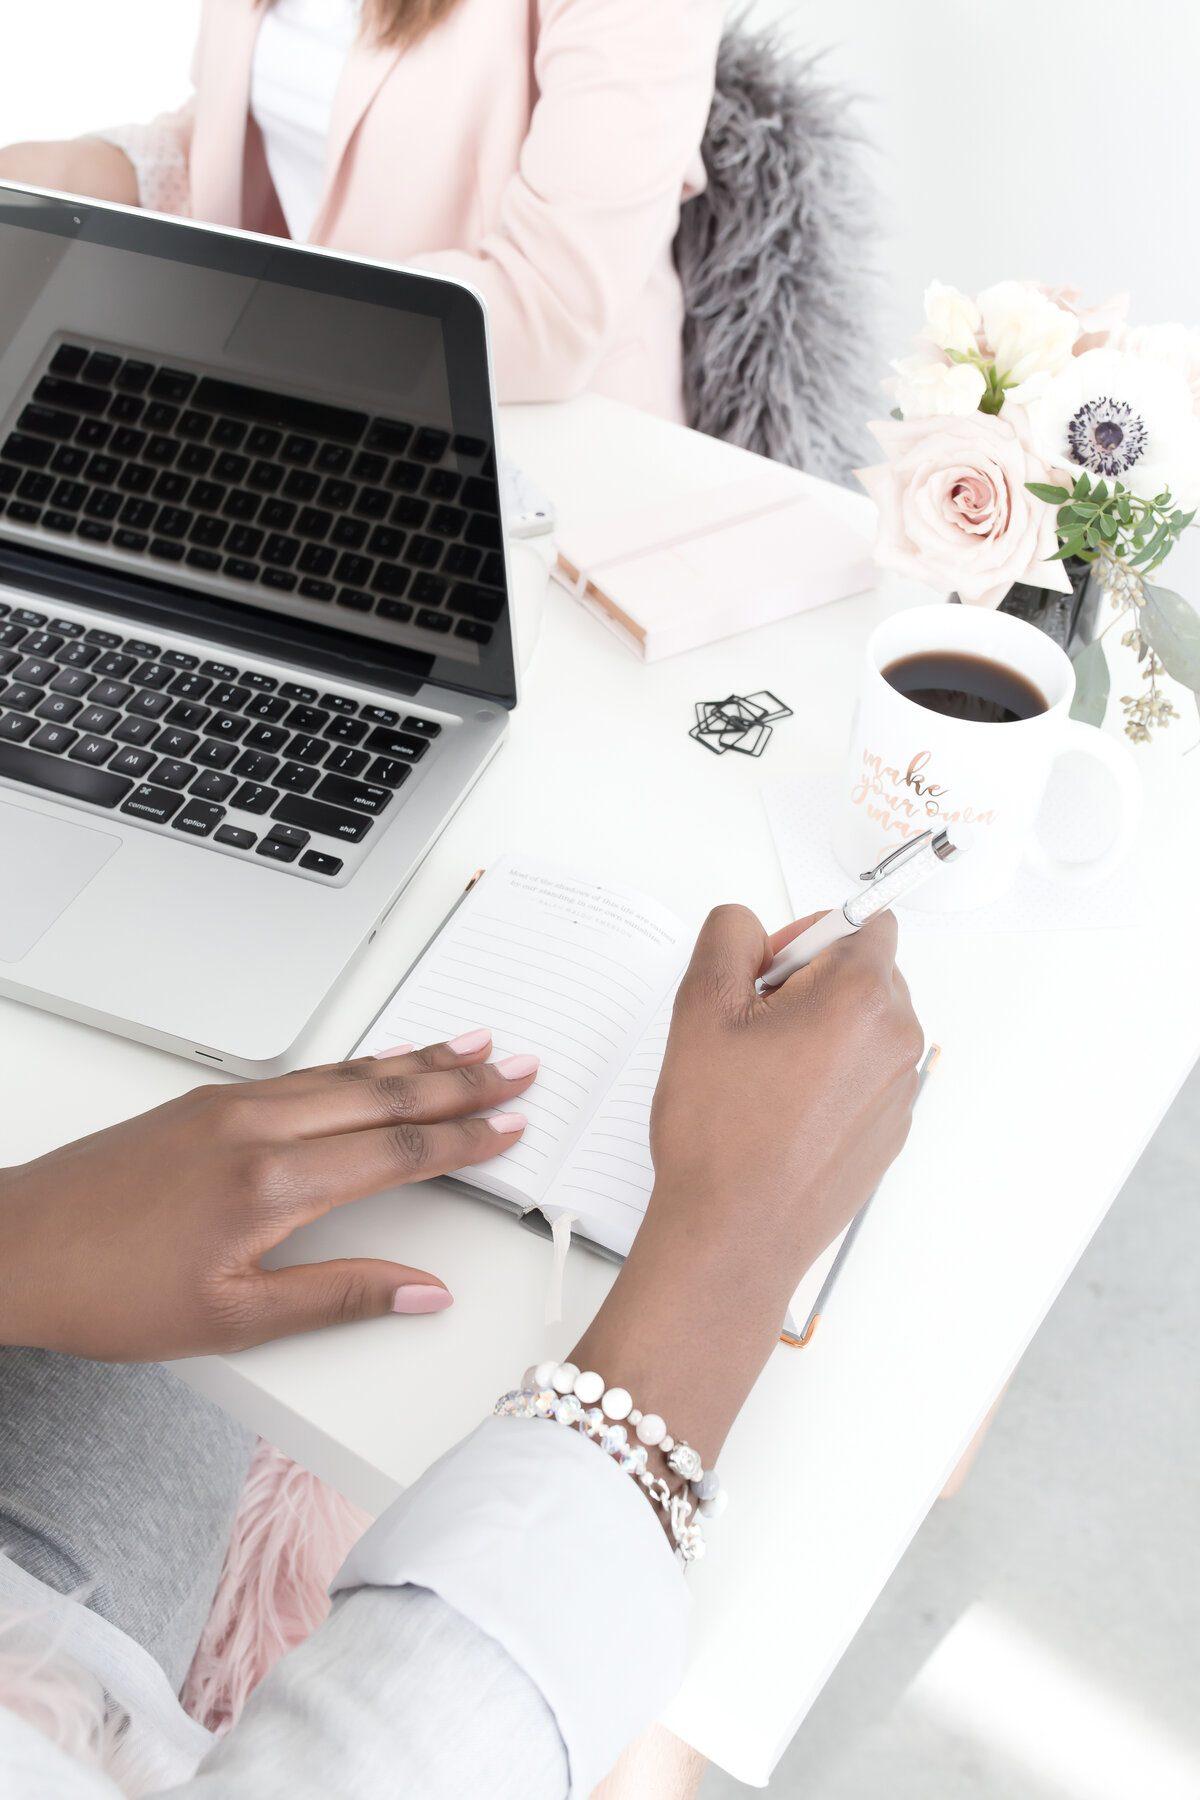 Online Business Academie